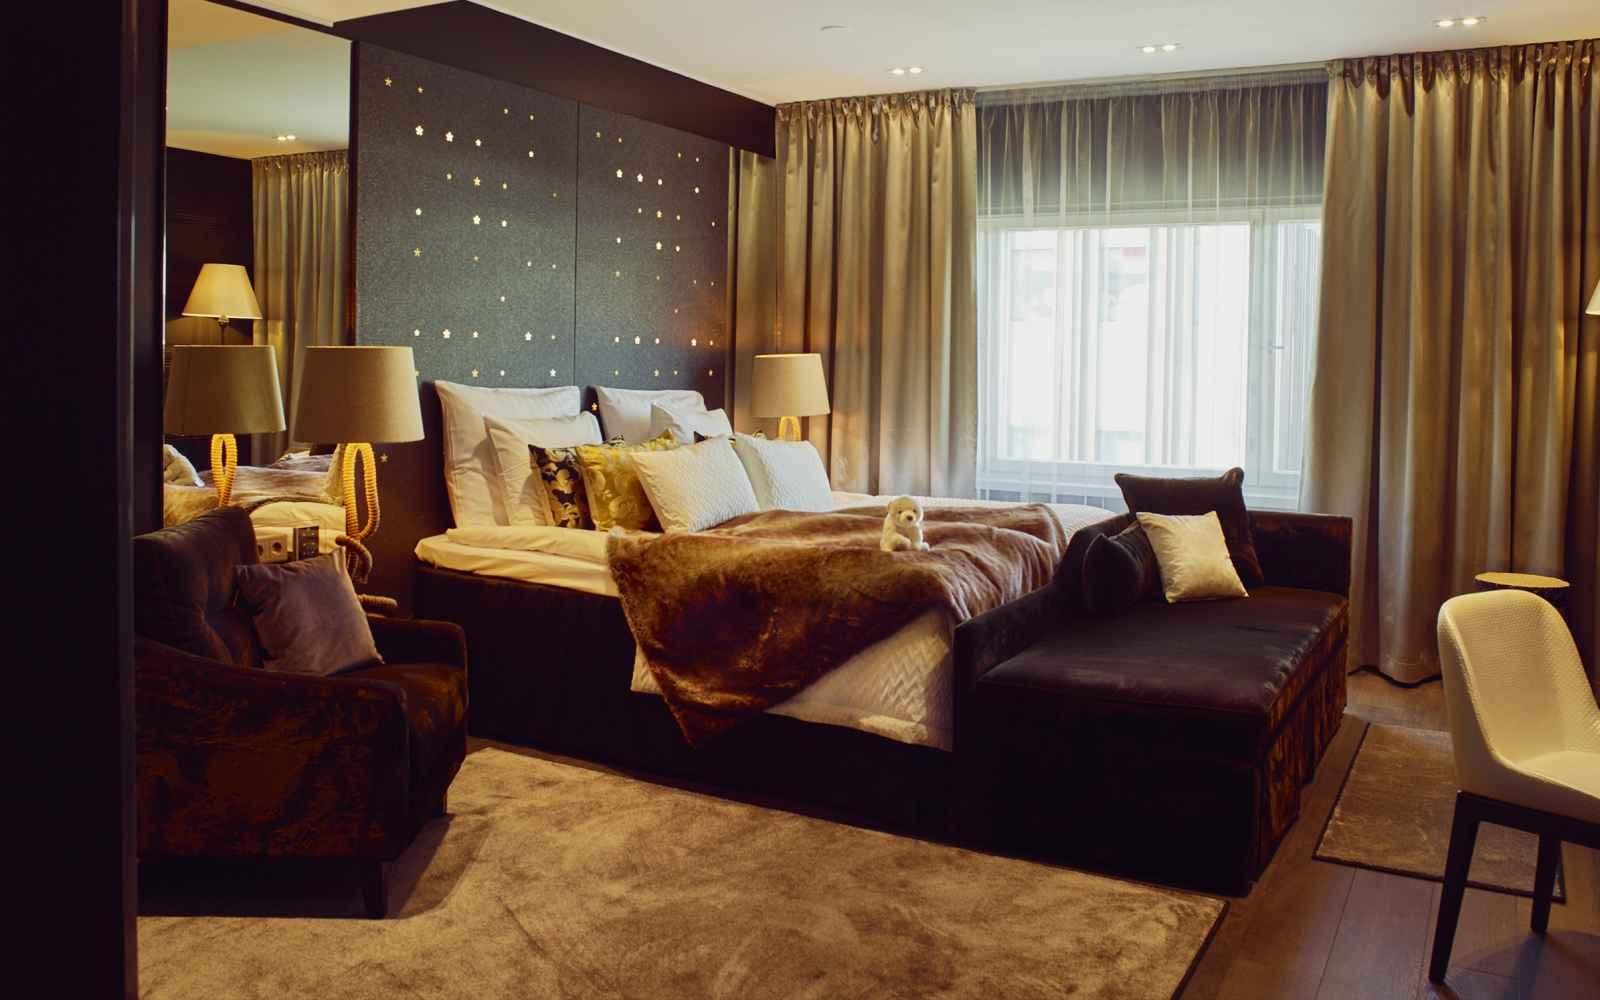 Arctic Light Hotel 4 jours / 3 nuits